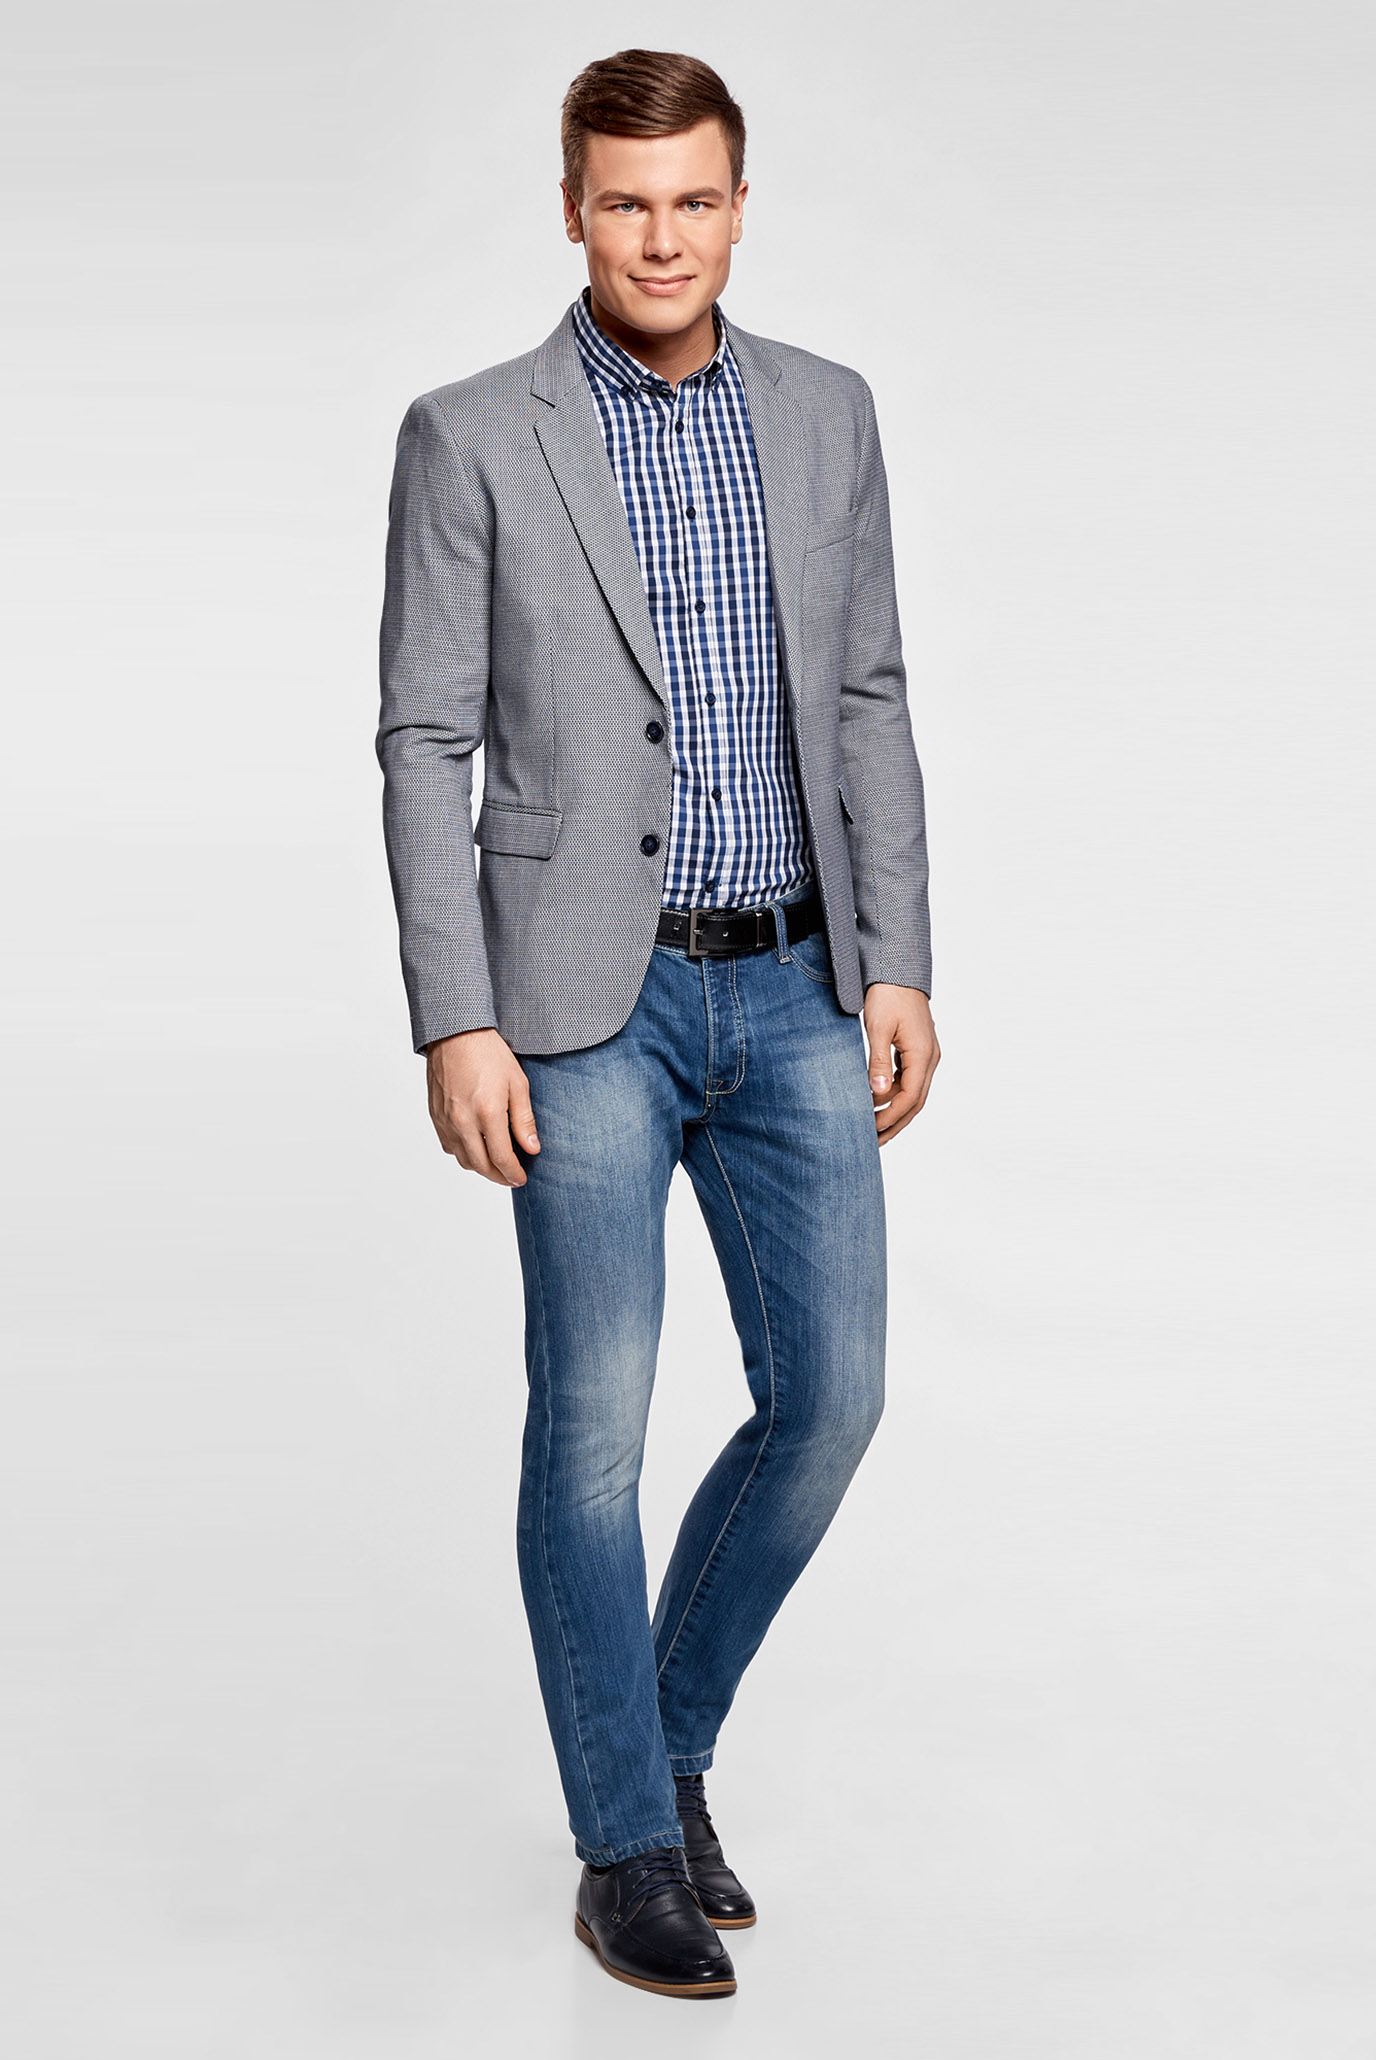 Купить Мужской темно-синий пиджак Oodji Oodji 2L420190M/46516N/7910J – Киев, Украина. Цены в интернет магазине MD Fashion